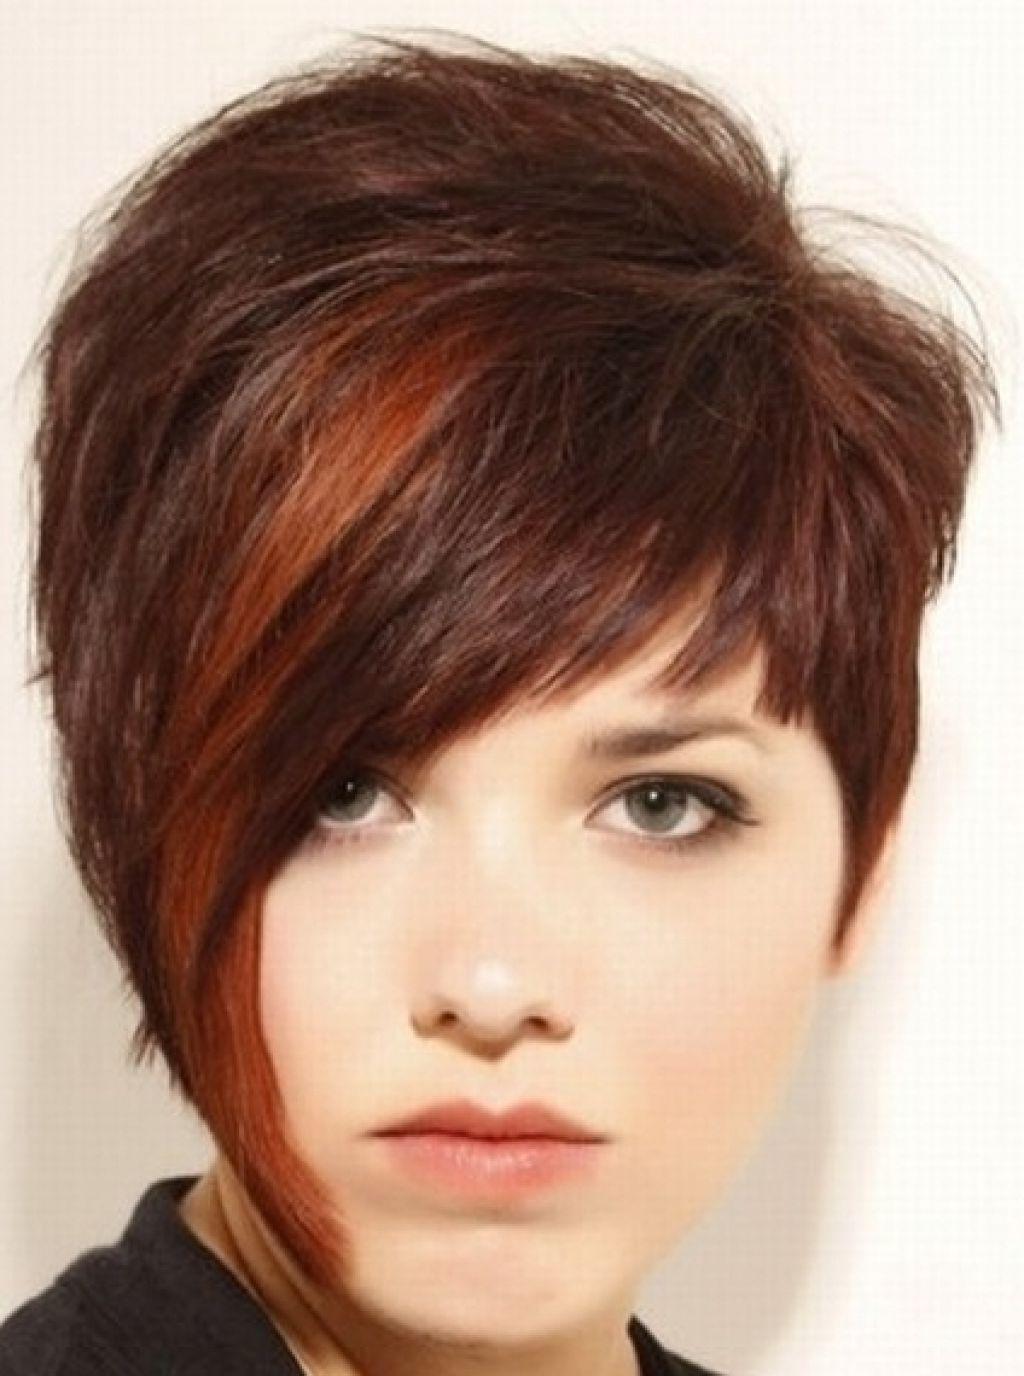 Asymetrical Short Hairstyles, Asymmetrical Hair, Asymmetrical Throughout Edgy Asymmetrical Short Haircuts (View 3 of 25)